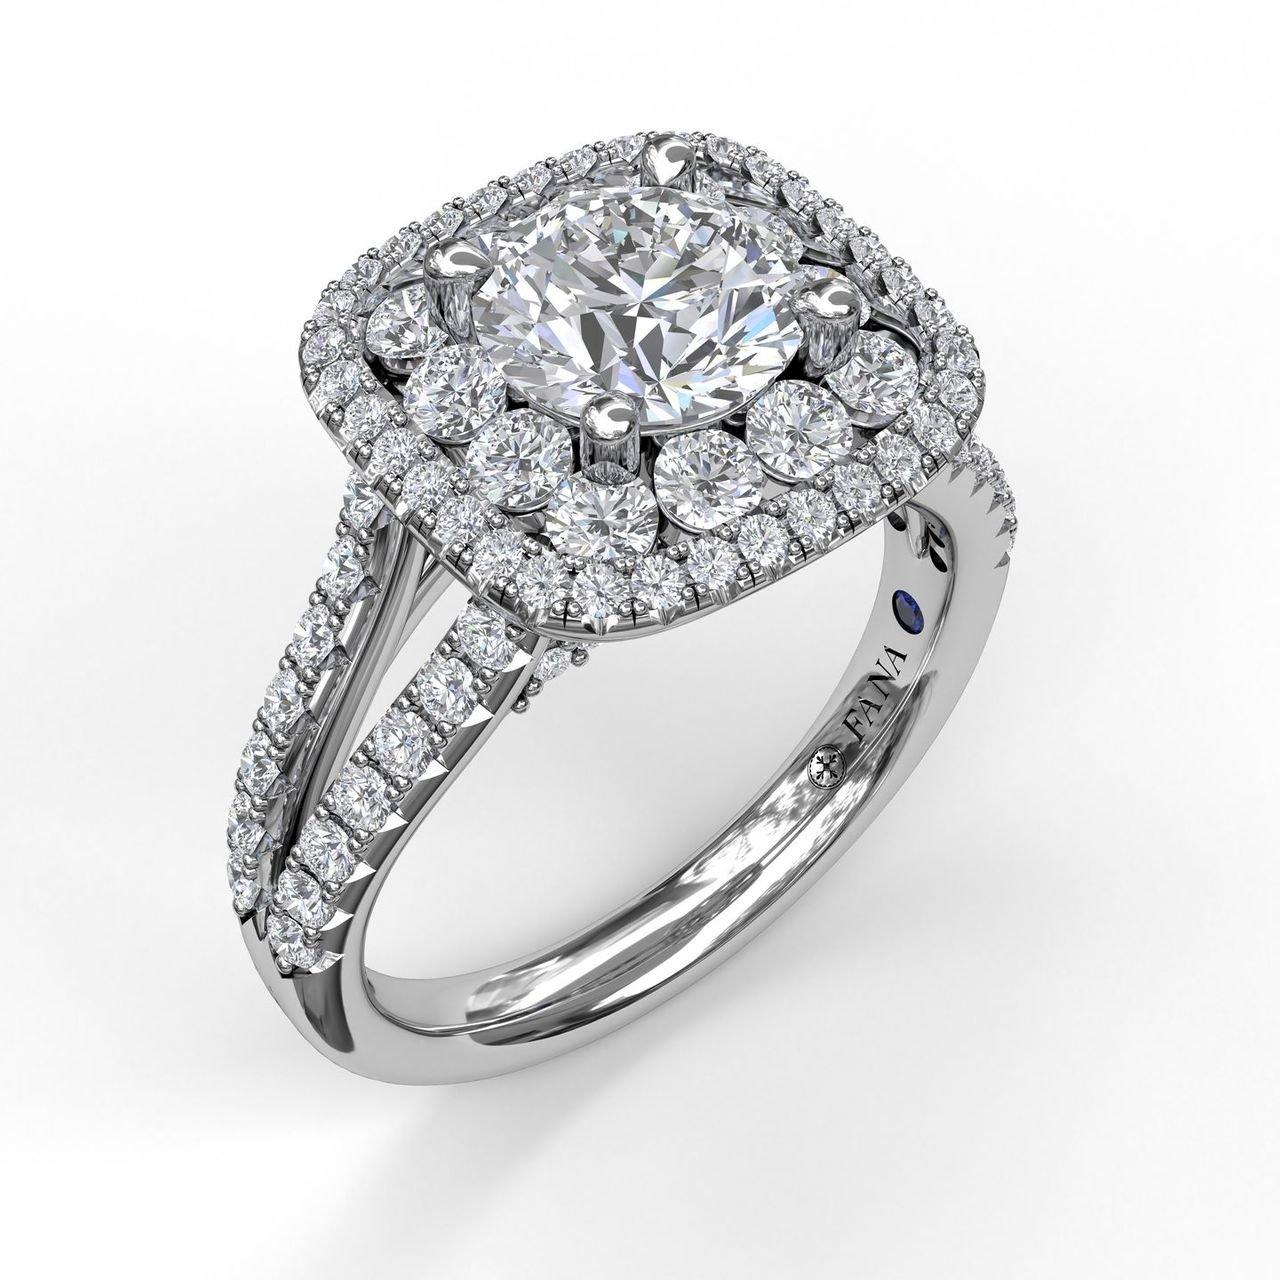 Fana Double Halo White Gold Diamond Engagement Ring Designer Engagement Rings Fine Jewelry Arthur S Jewelers